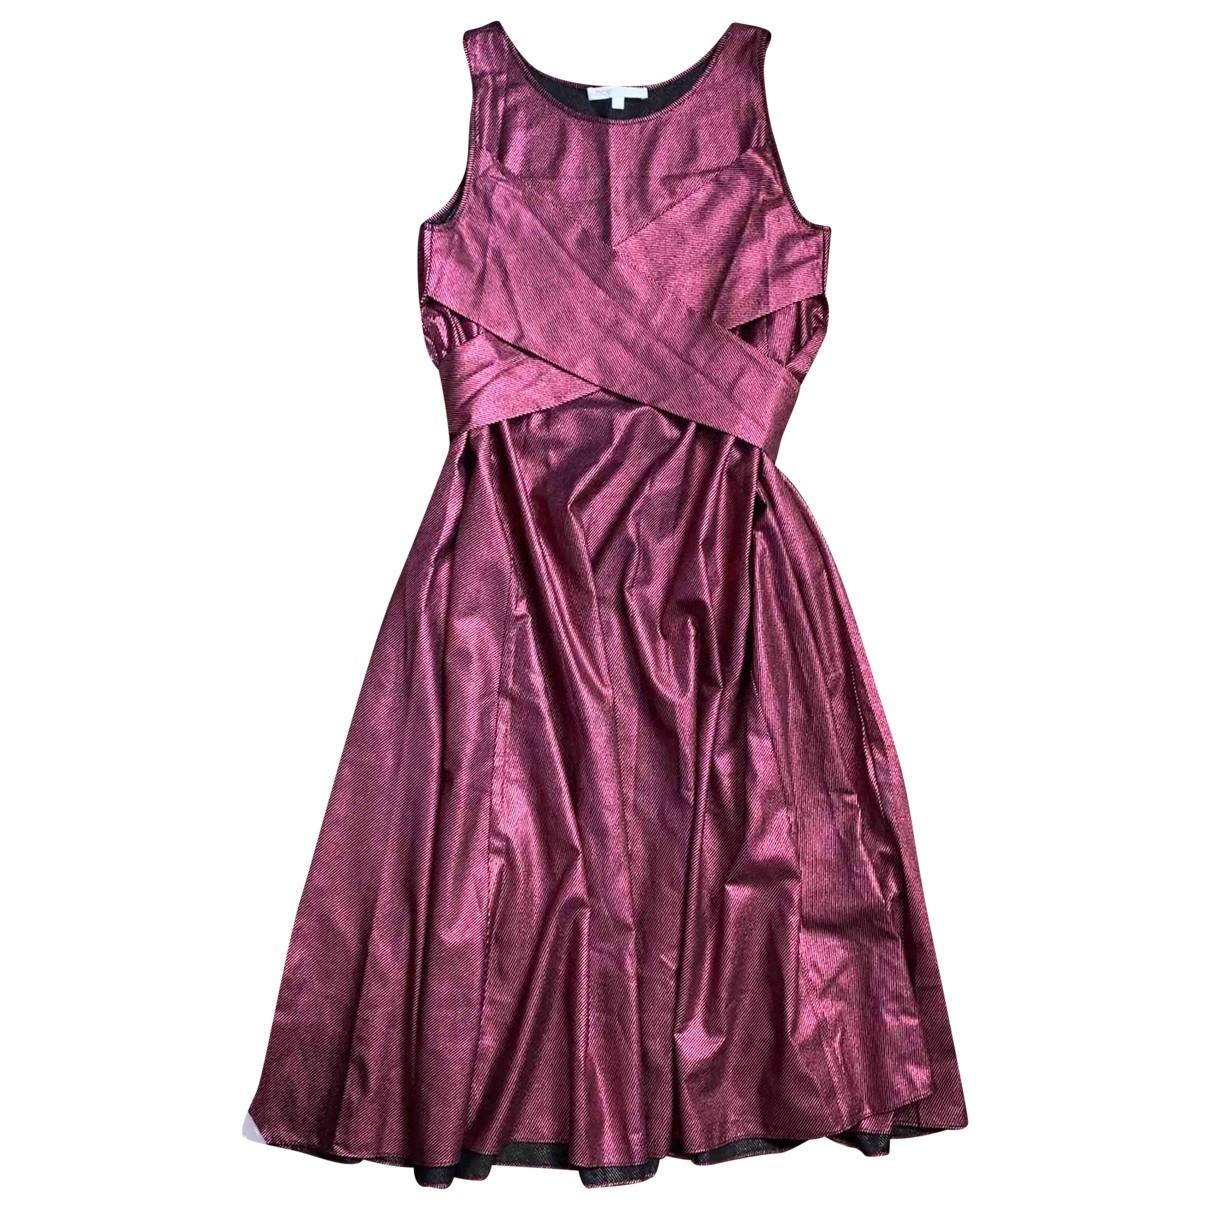 Maje Spring Summer 2019 Pink dress for Women 1 0-5